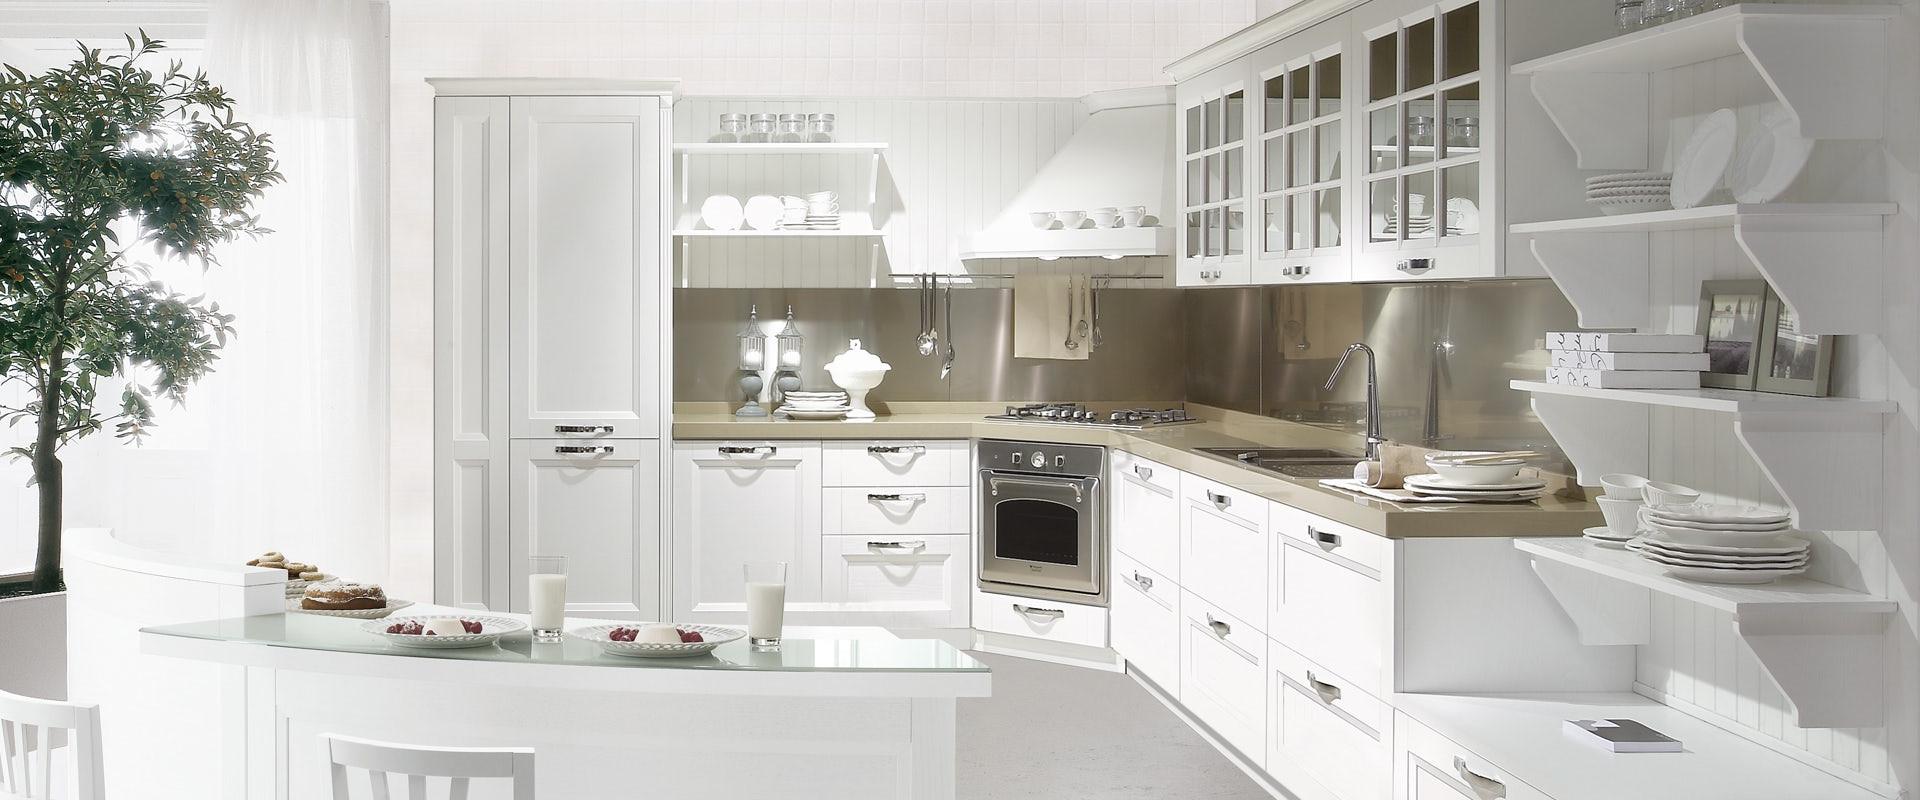 stosa-cucine-classiche-beverly-29.jpg